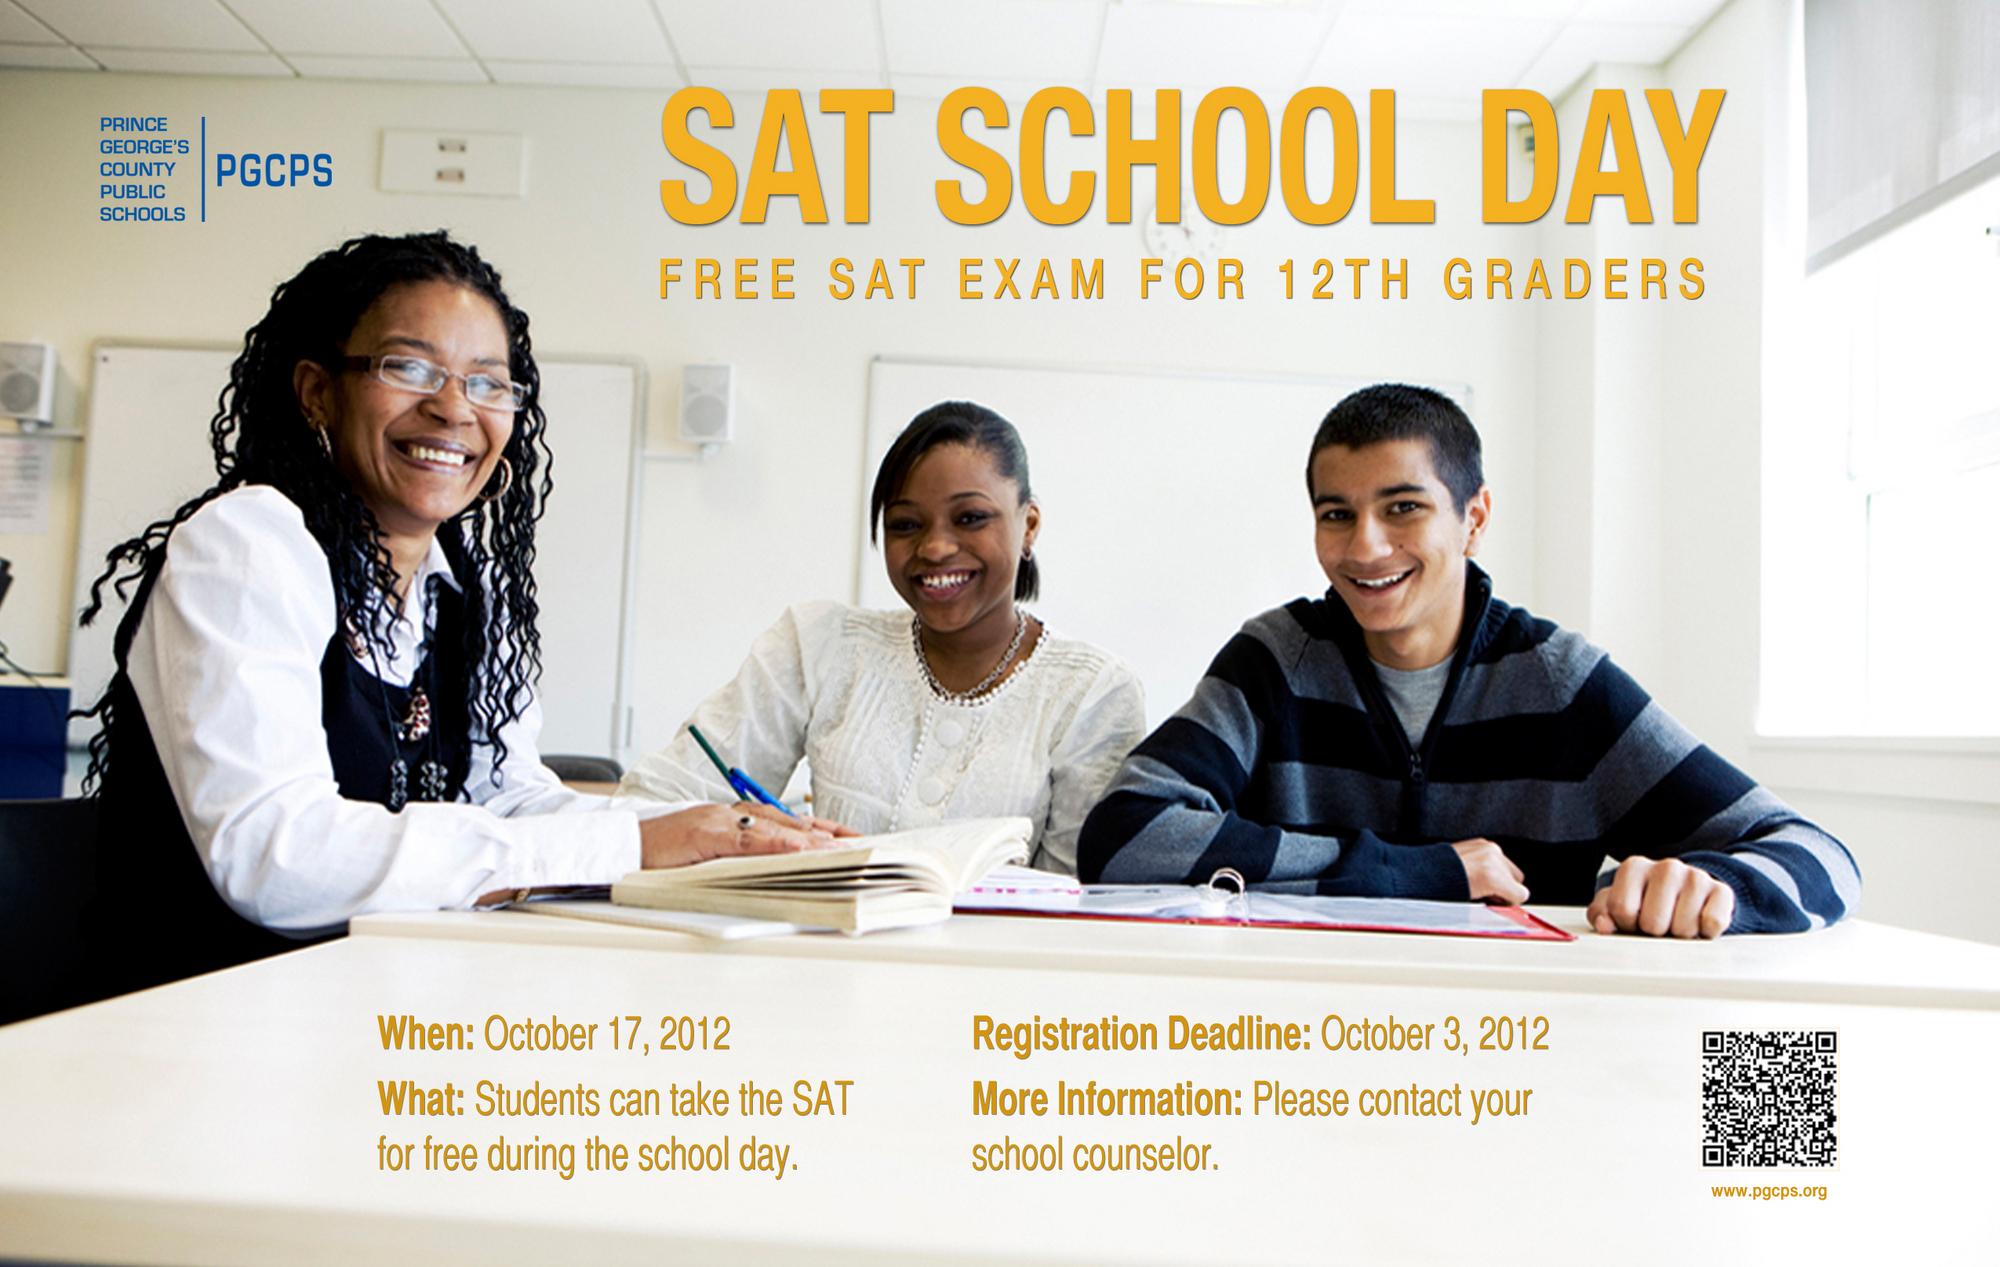 SAT School Day Info